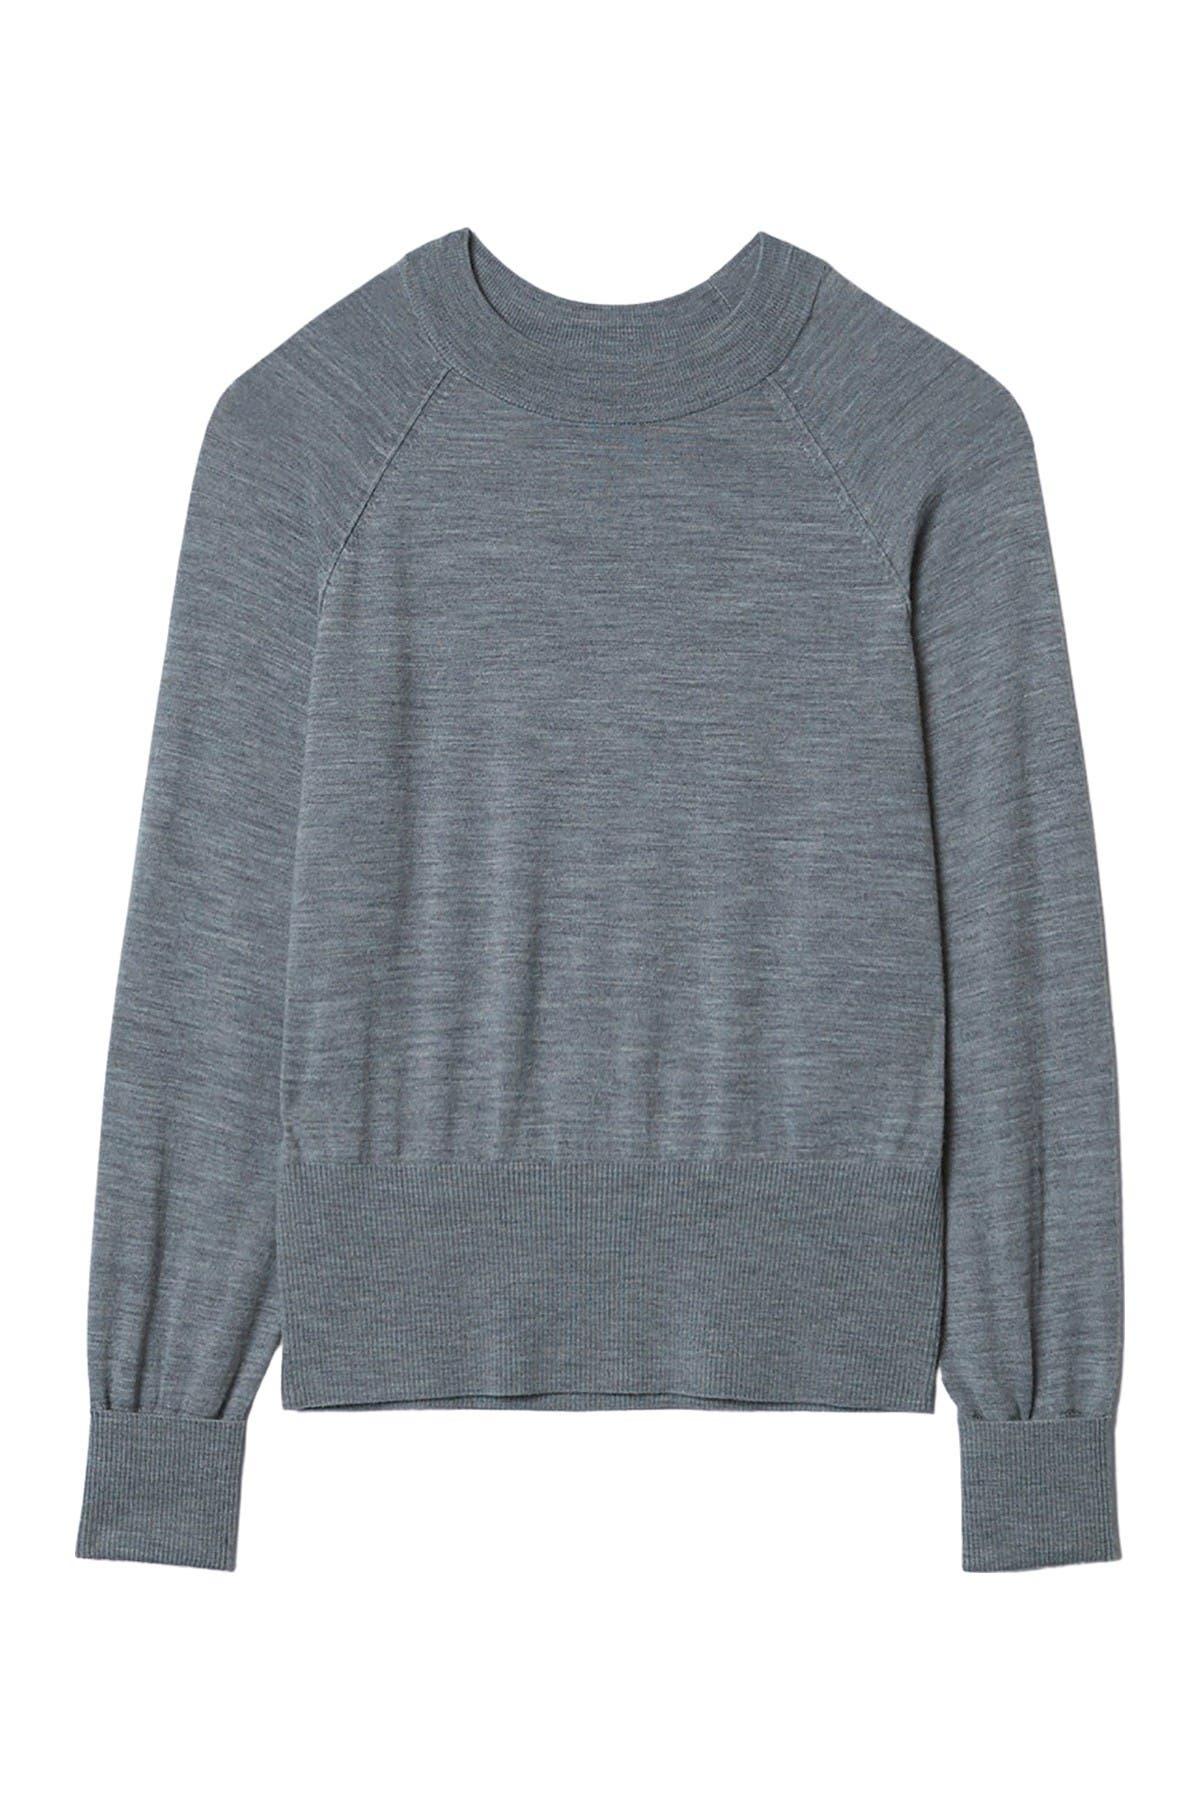 Image of BLDWN Grove Sweater